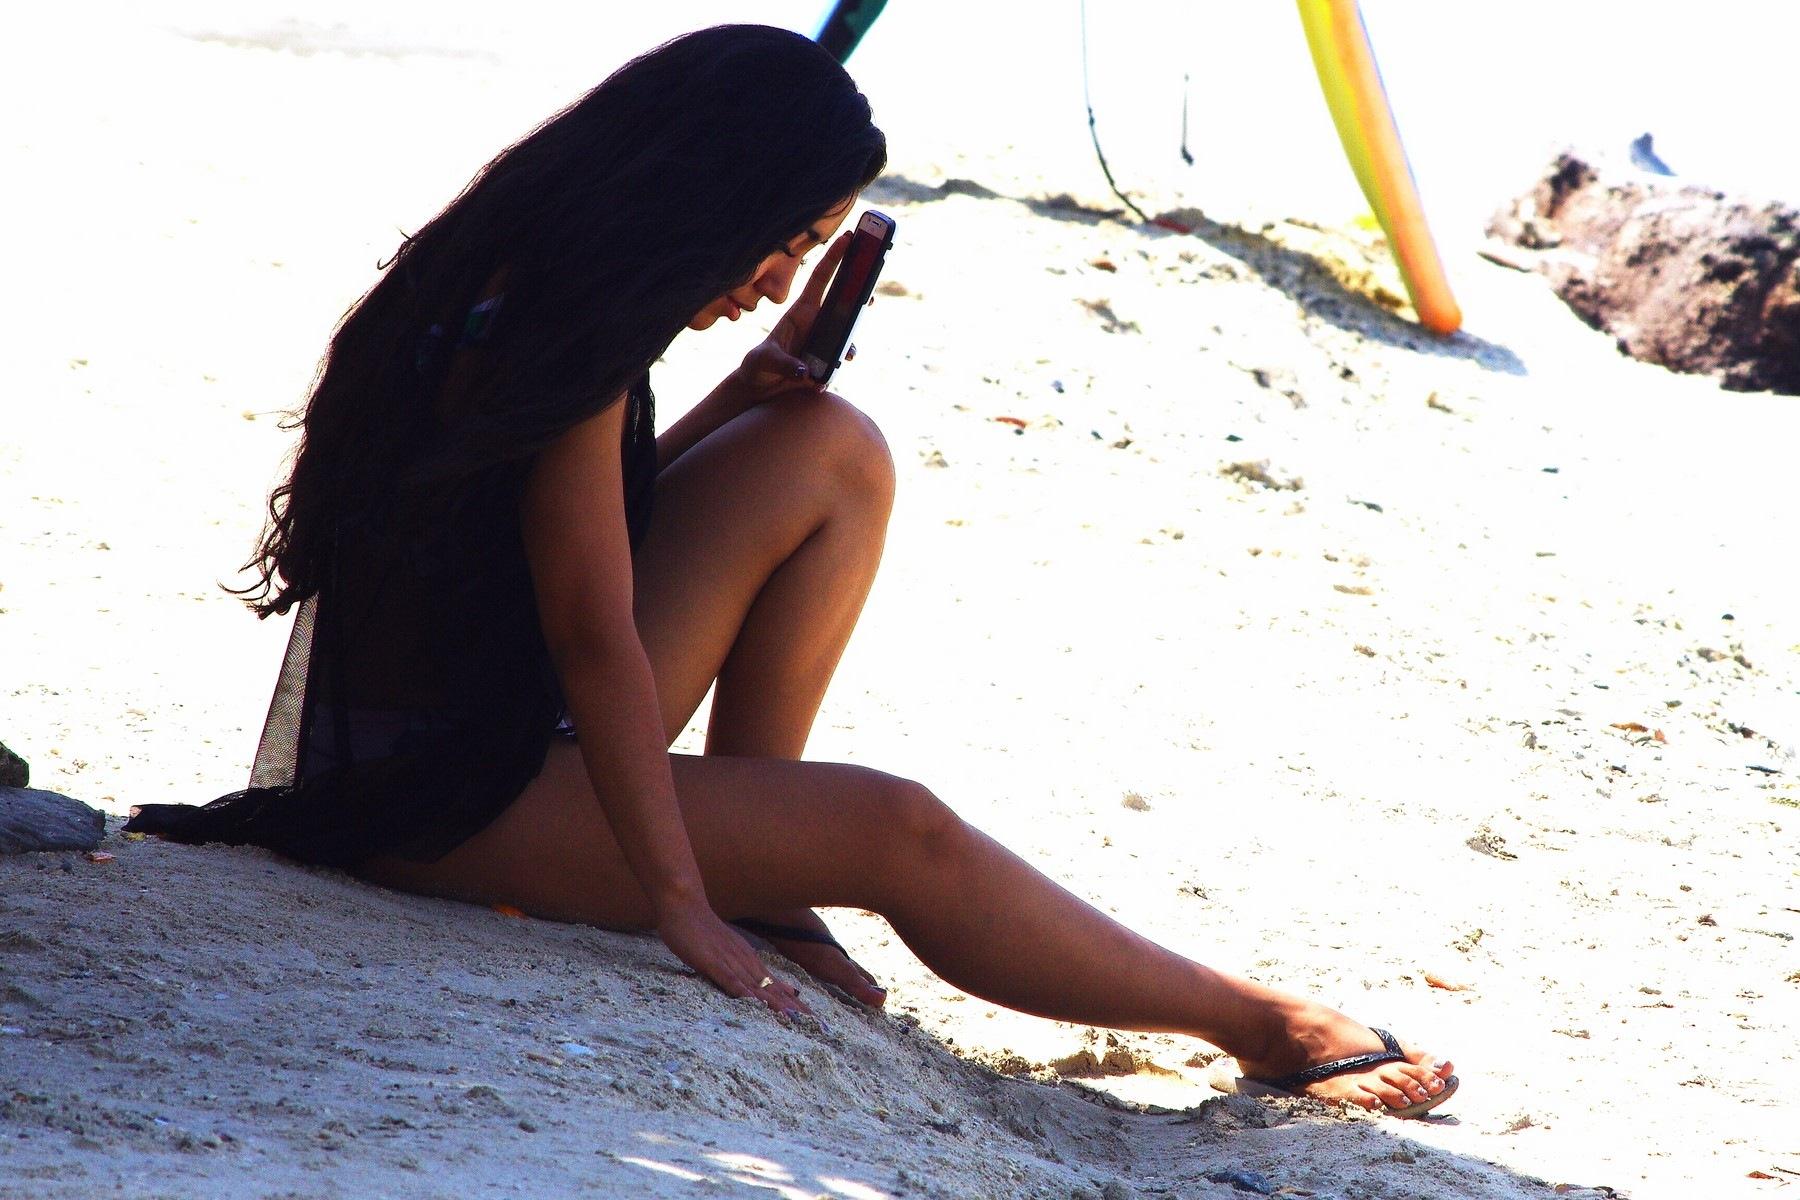 Girl on the beach by Dan Steeves